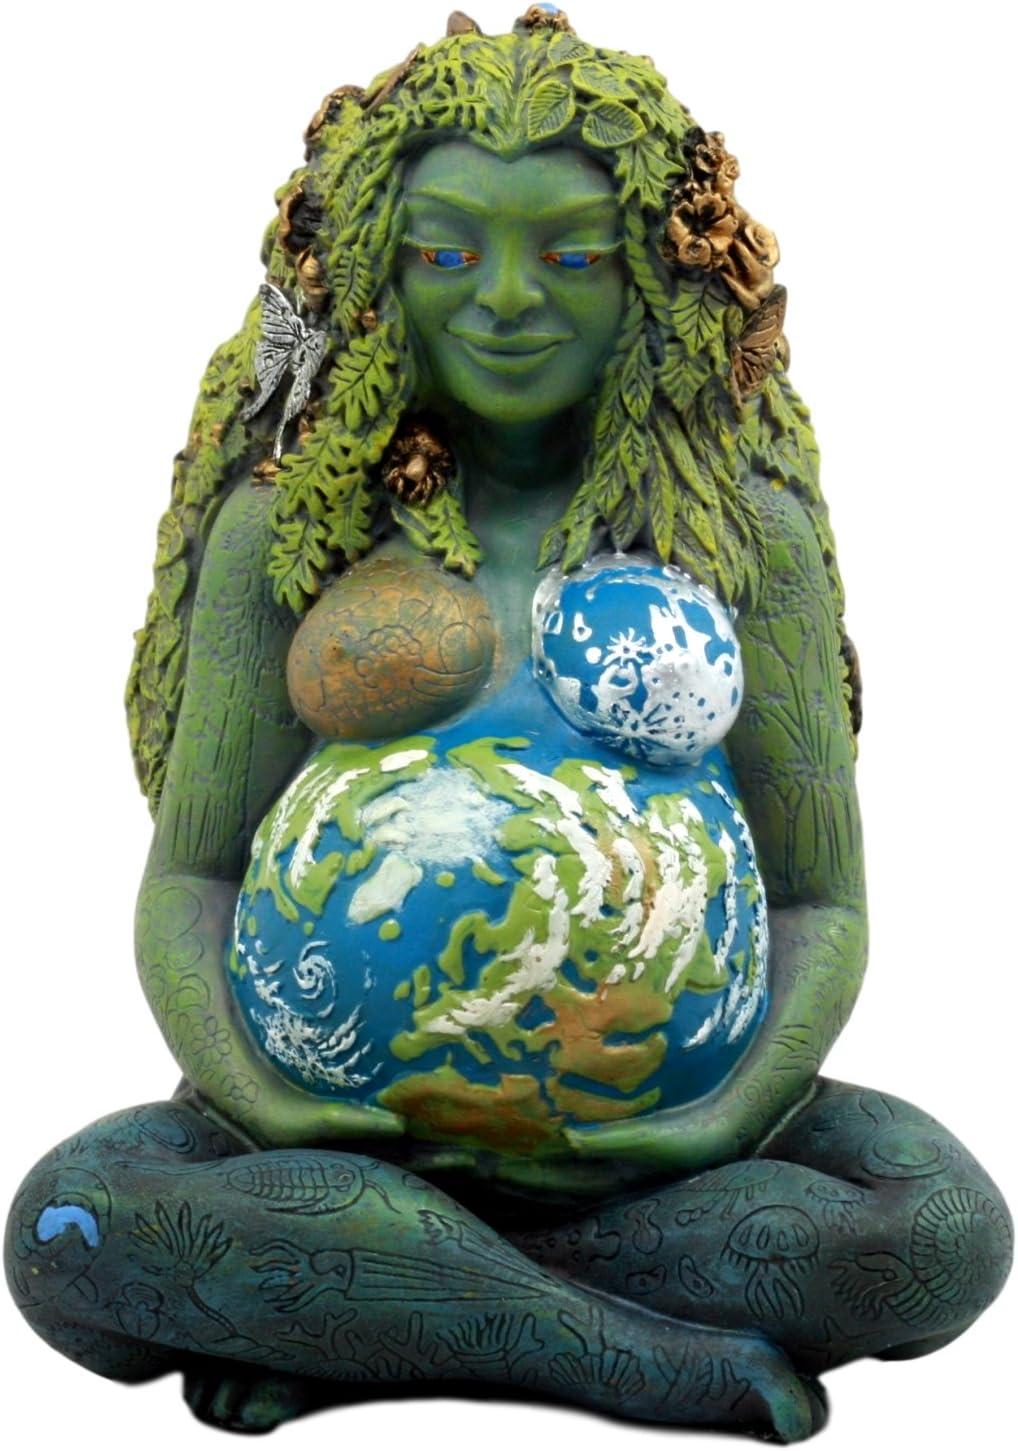 Ebros Gift Millennial Gaia Earth Mother Statue Goddess Fiti Te online shopping Sale 7